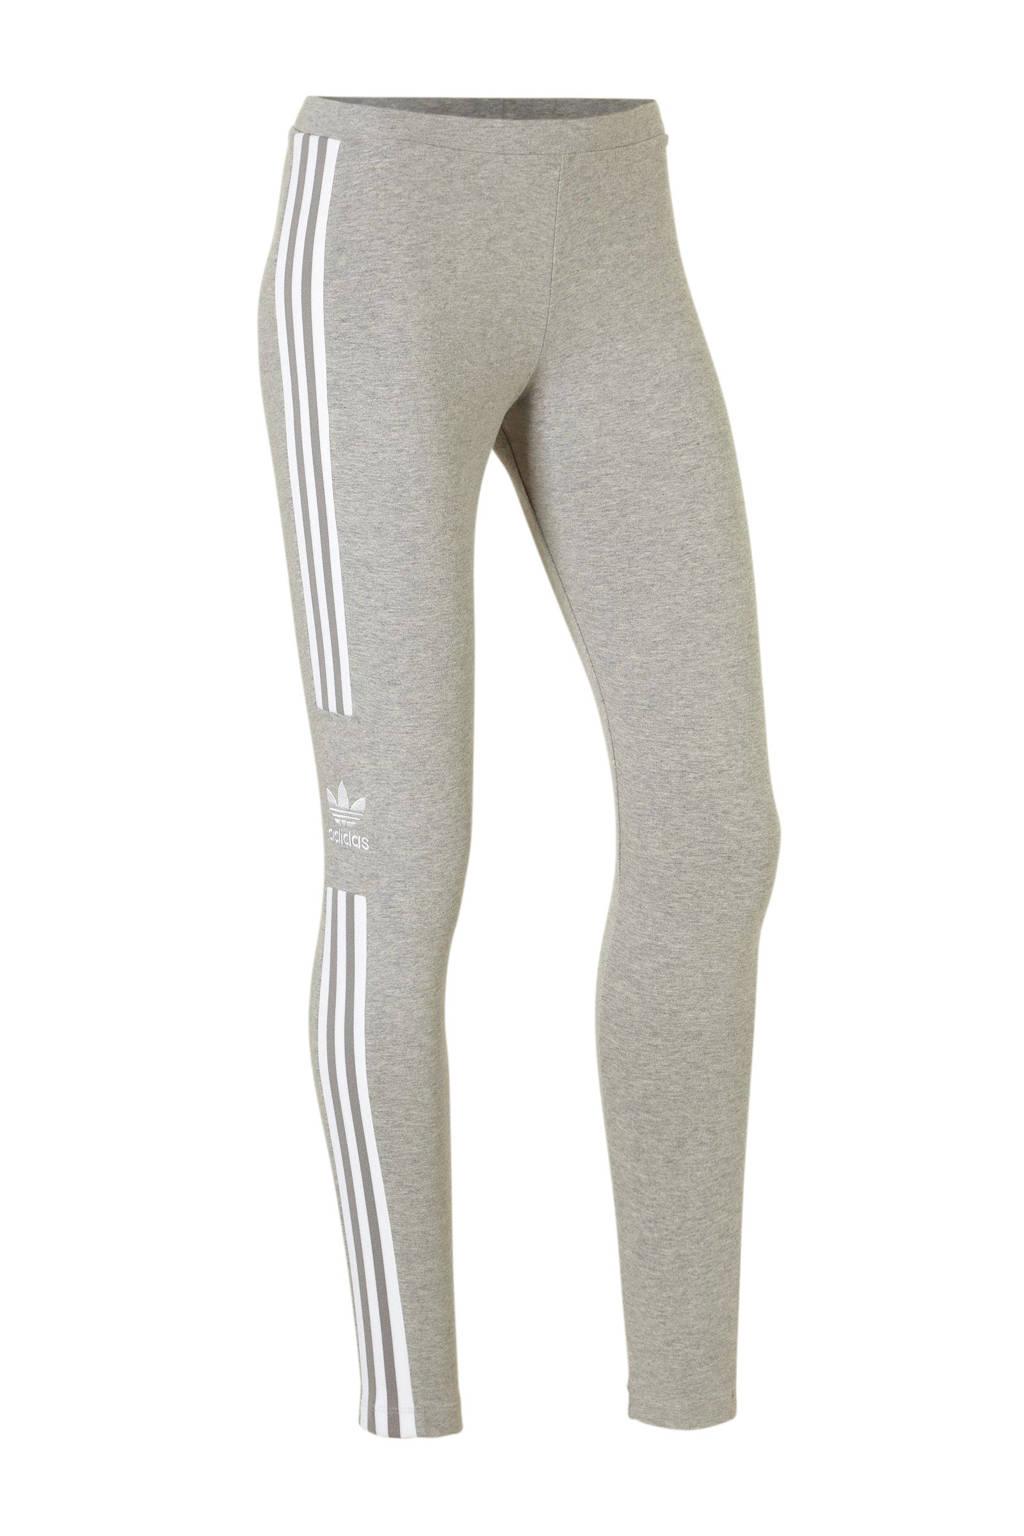 adidas originals 7/8 legging grijs melange, Grijs melange/wit